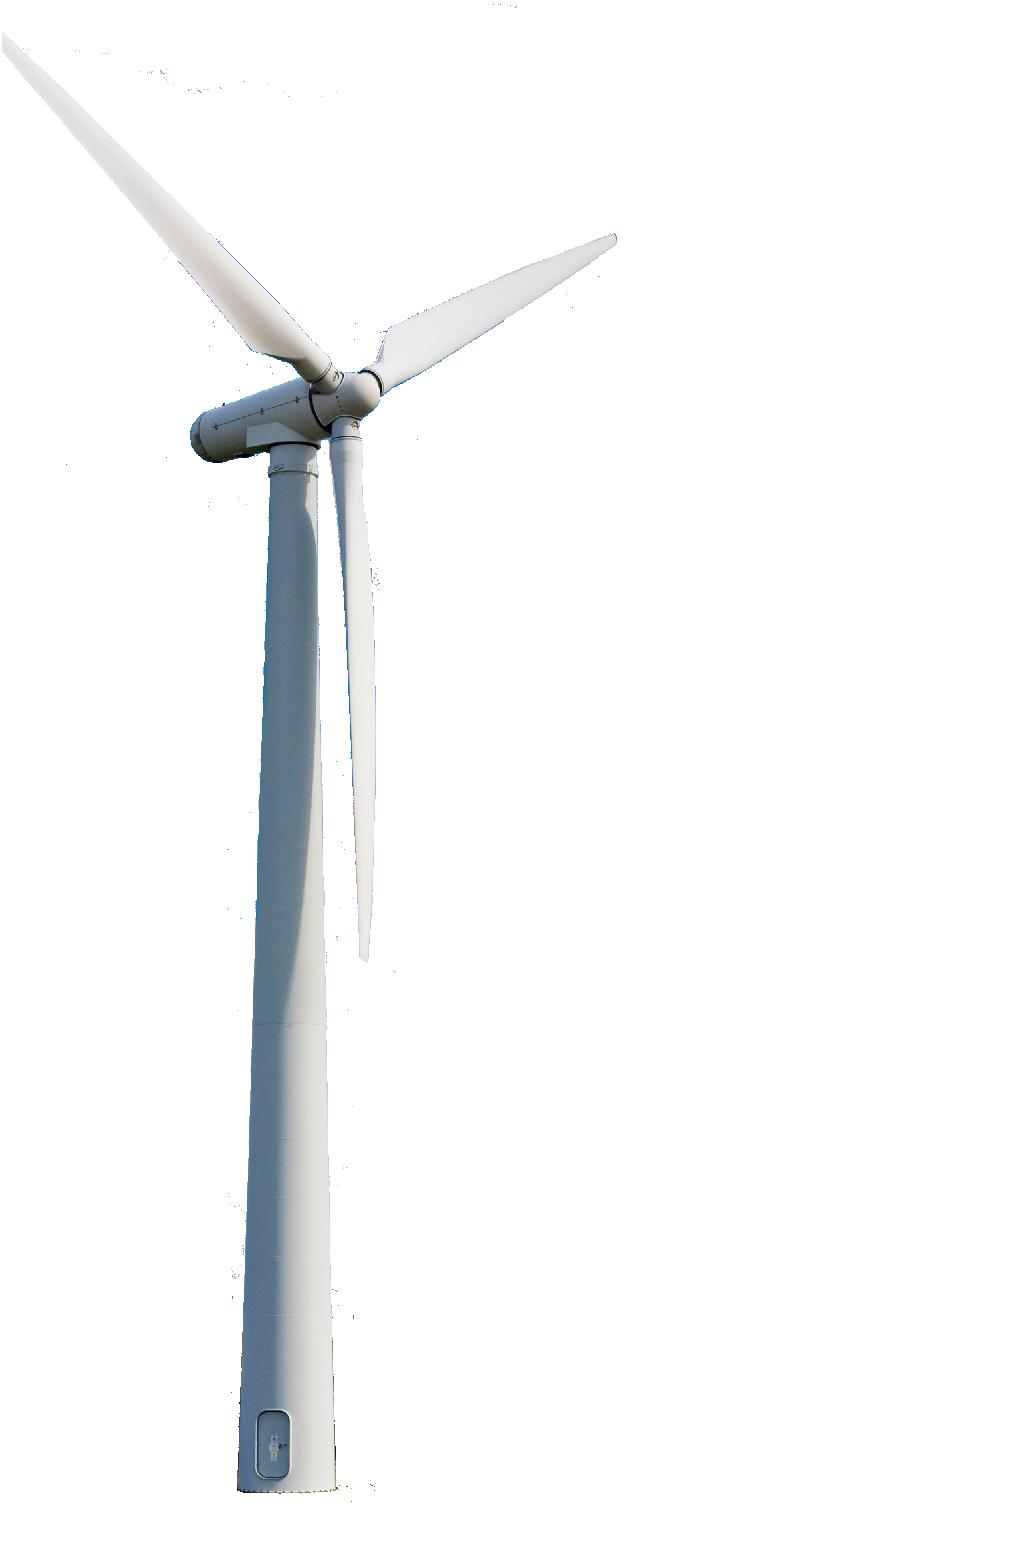 tower bolt, foundation systems, windturbine